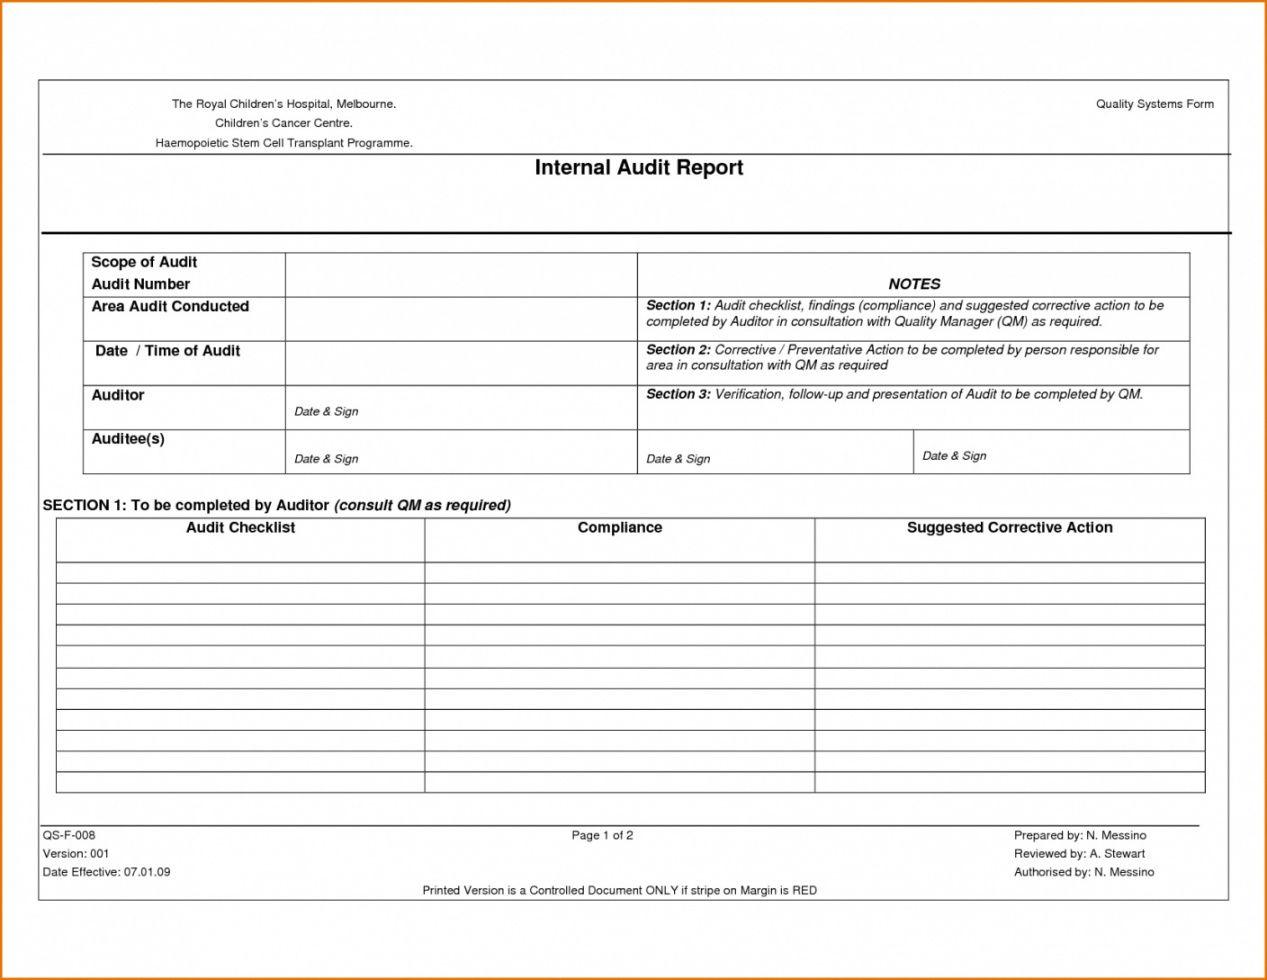 printable checklist template samples supplier audit internal report quality vendor audit checklist template samples